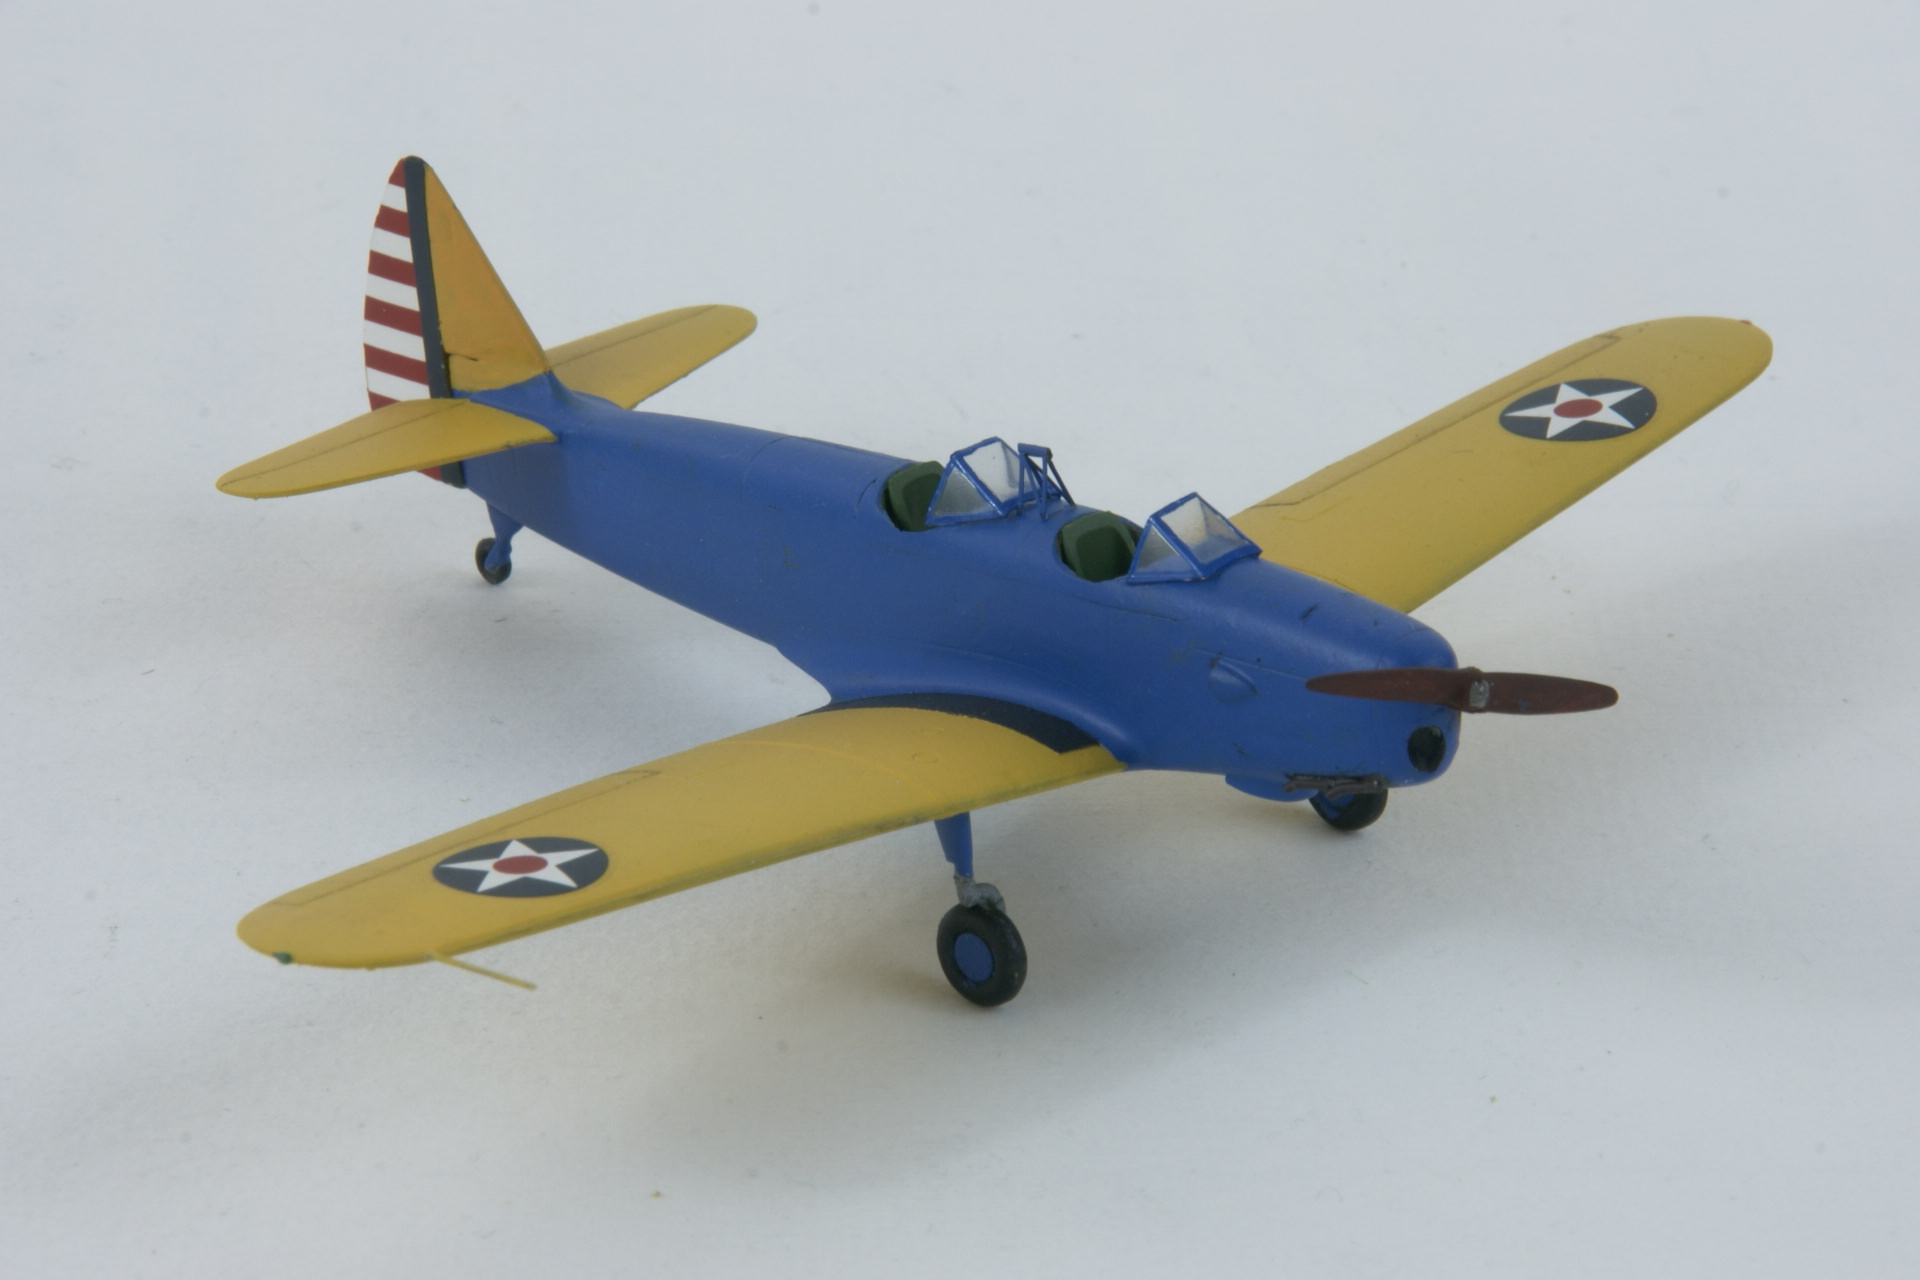 Fairchild pt 19 cornell 3 2